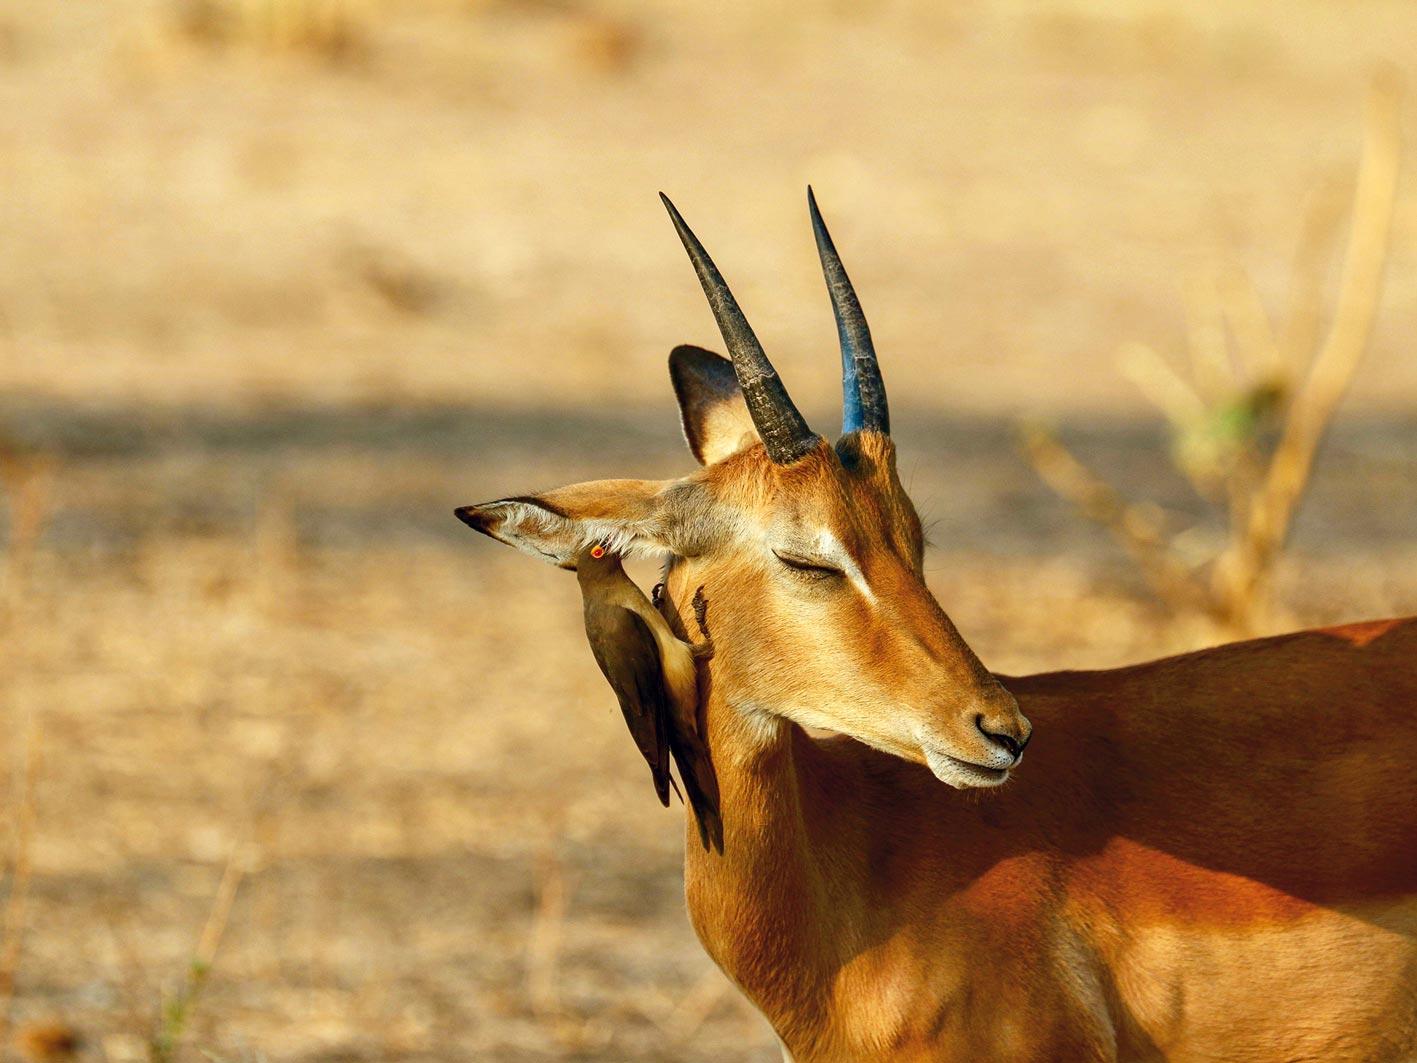 Impala mit Vogel im Ohr, Zambia-Safari